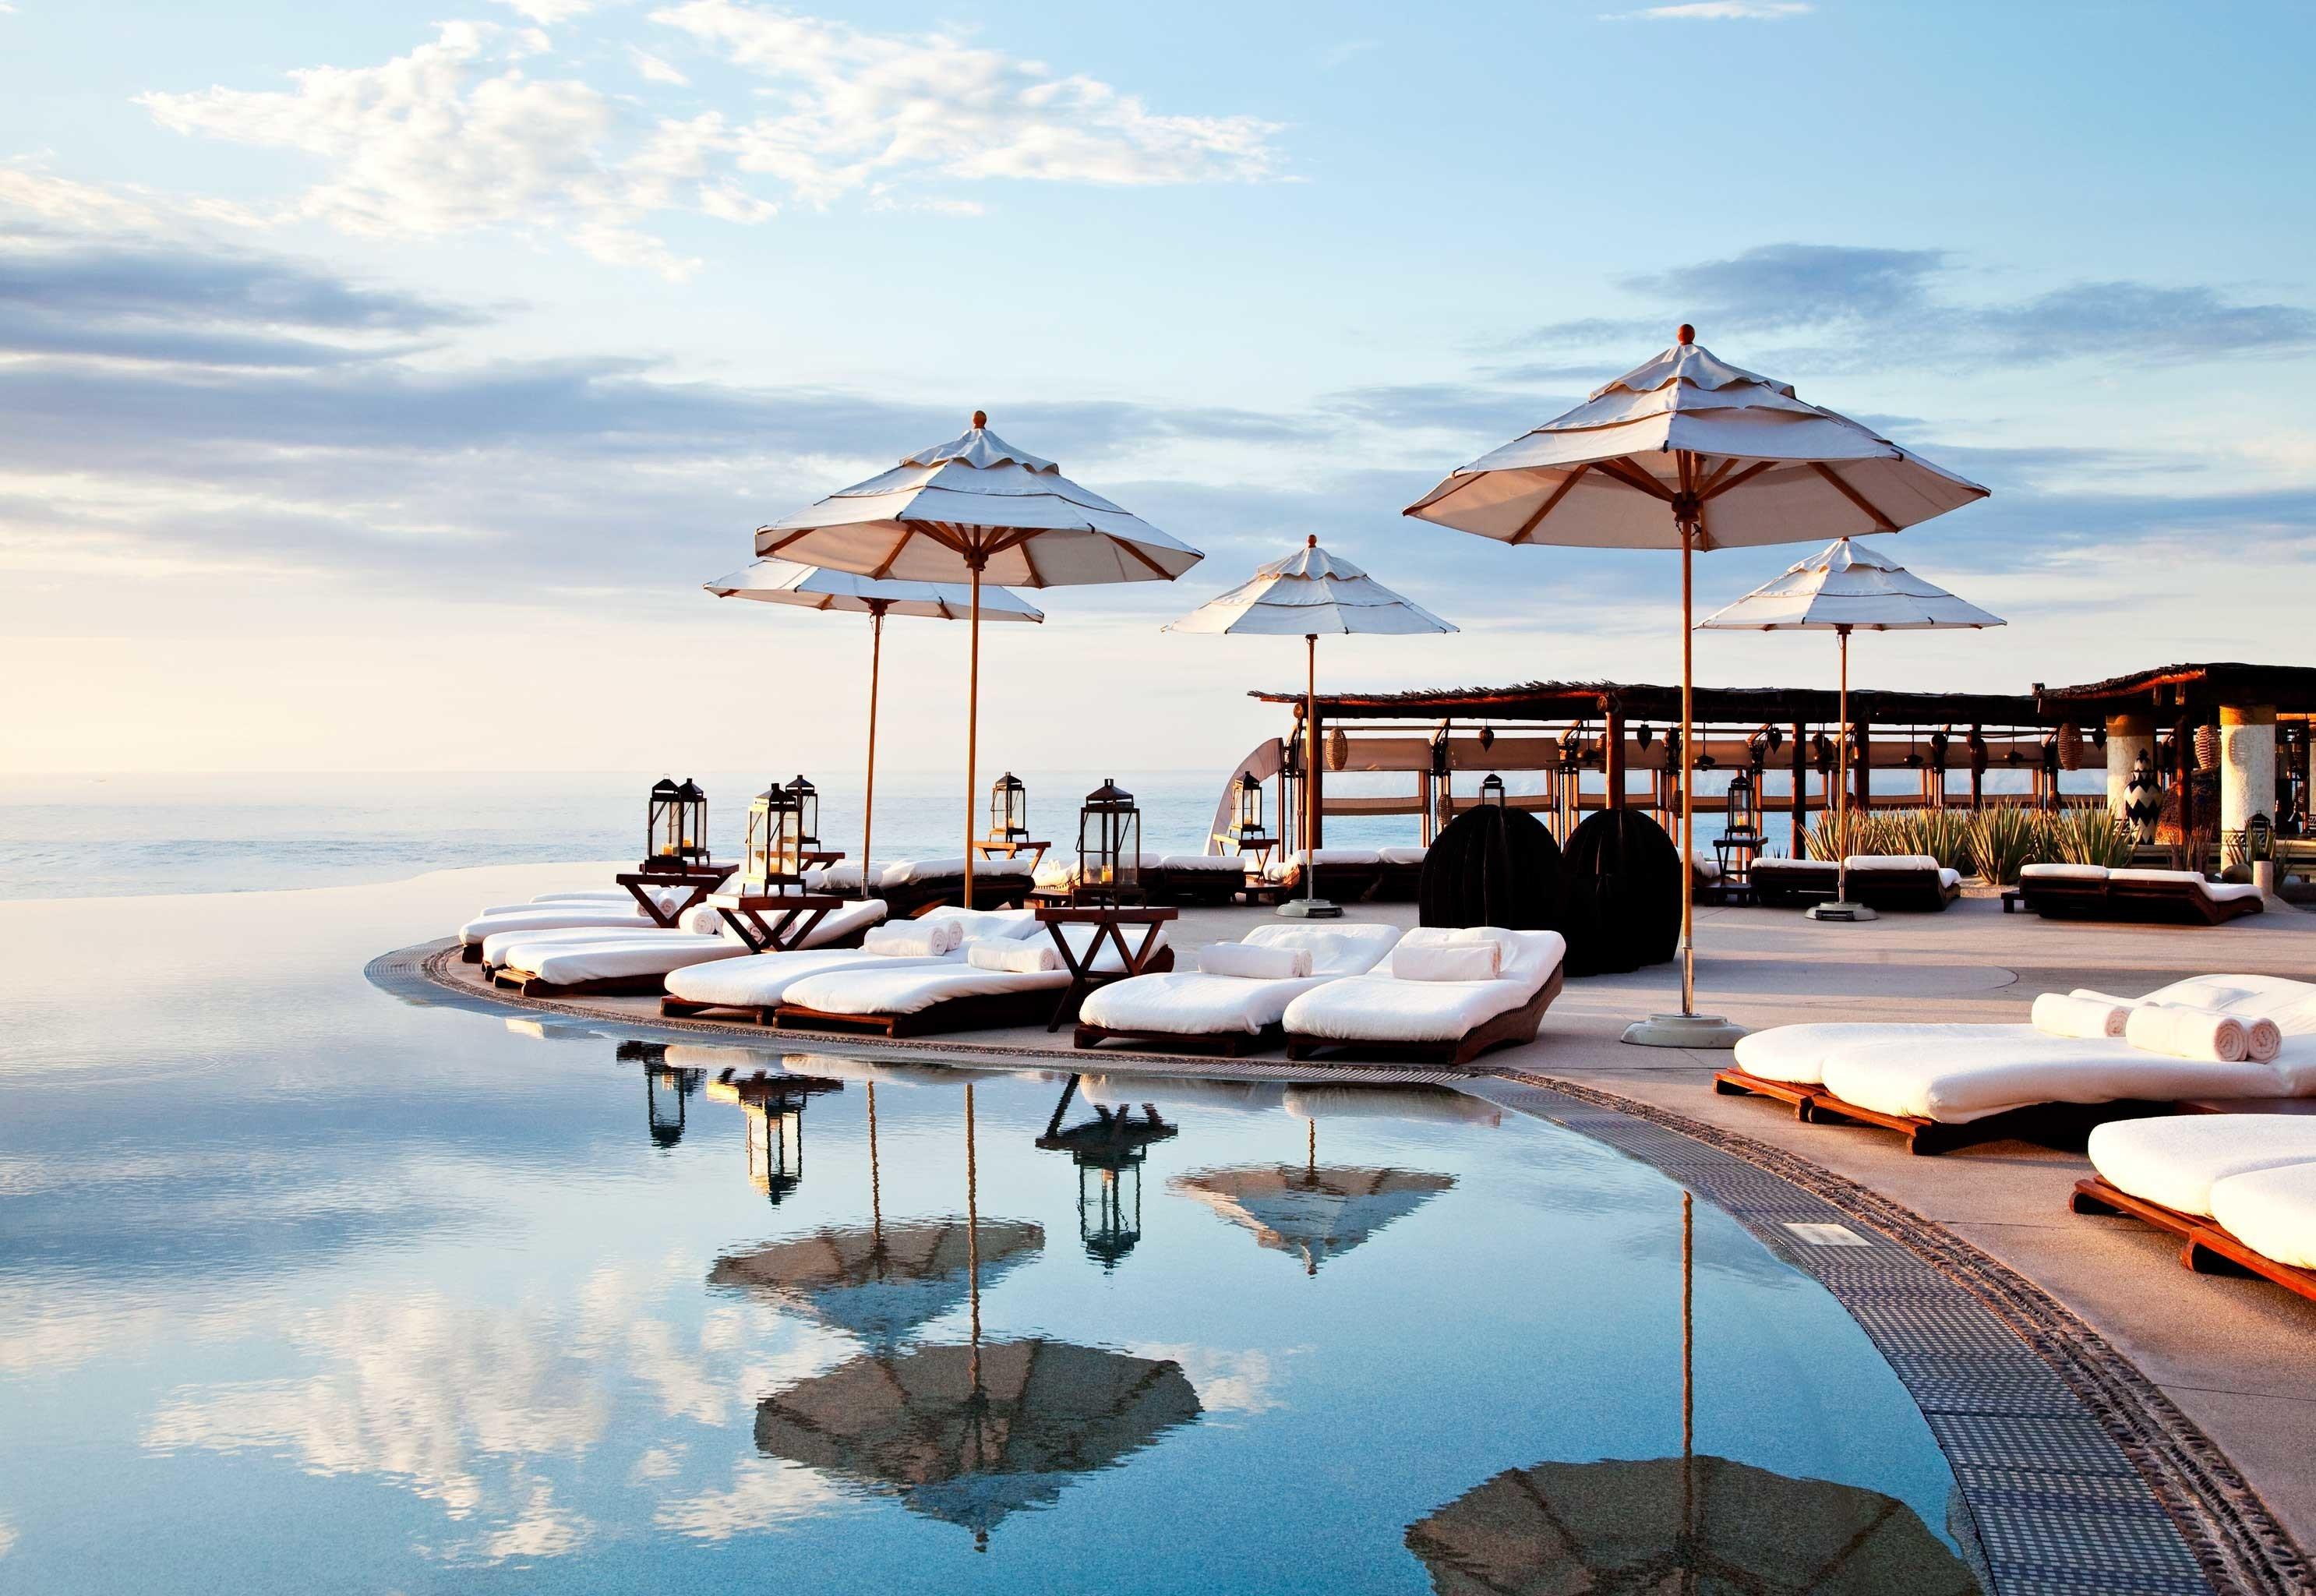 Beach Beachfront Honeymoon Hotels Living Lounge Mexico Romance Tulum sky outdoor leisure marina Resort vacation Sea dock vehicle yacht bay several day